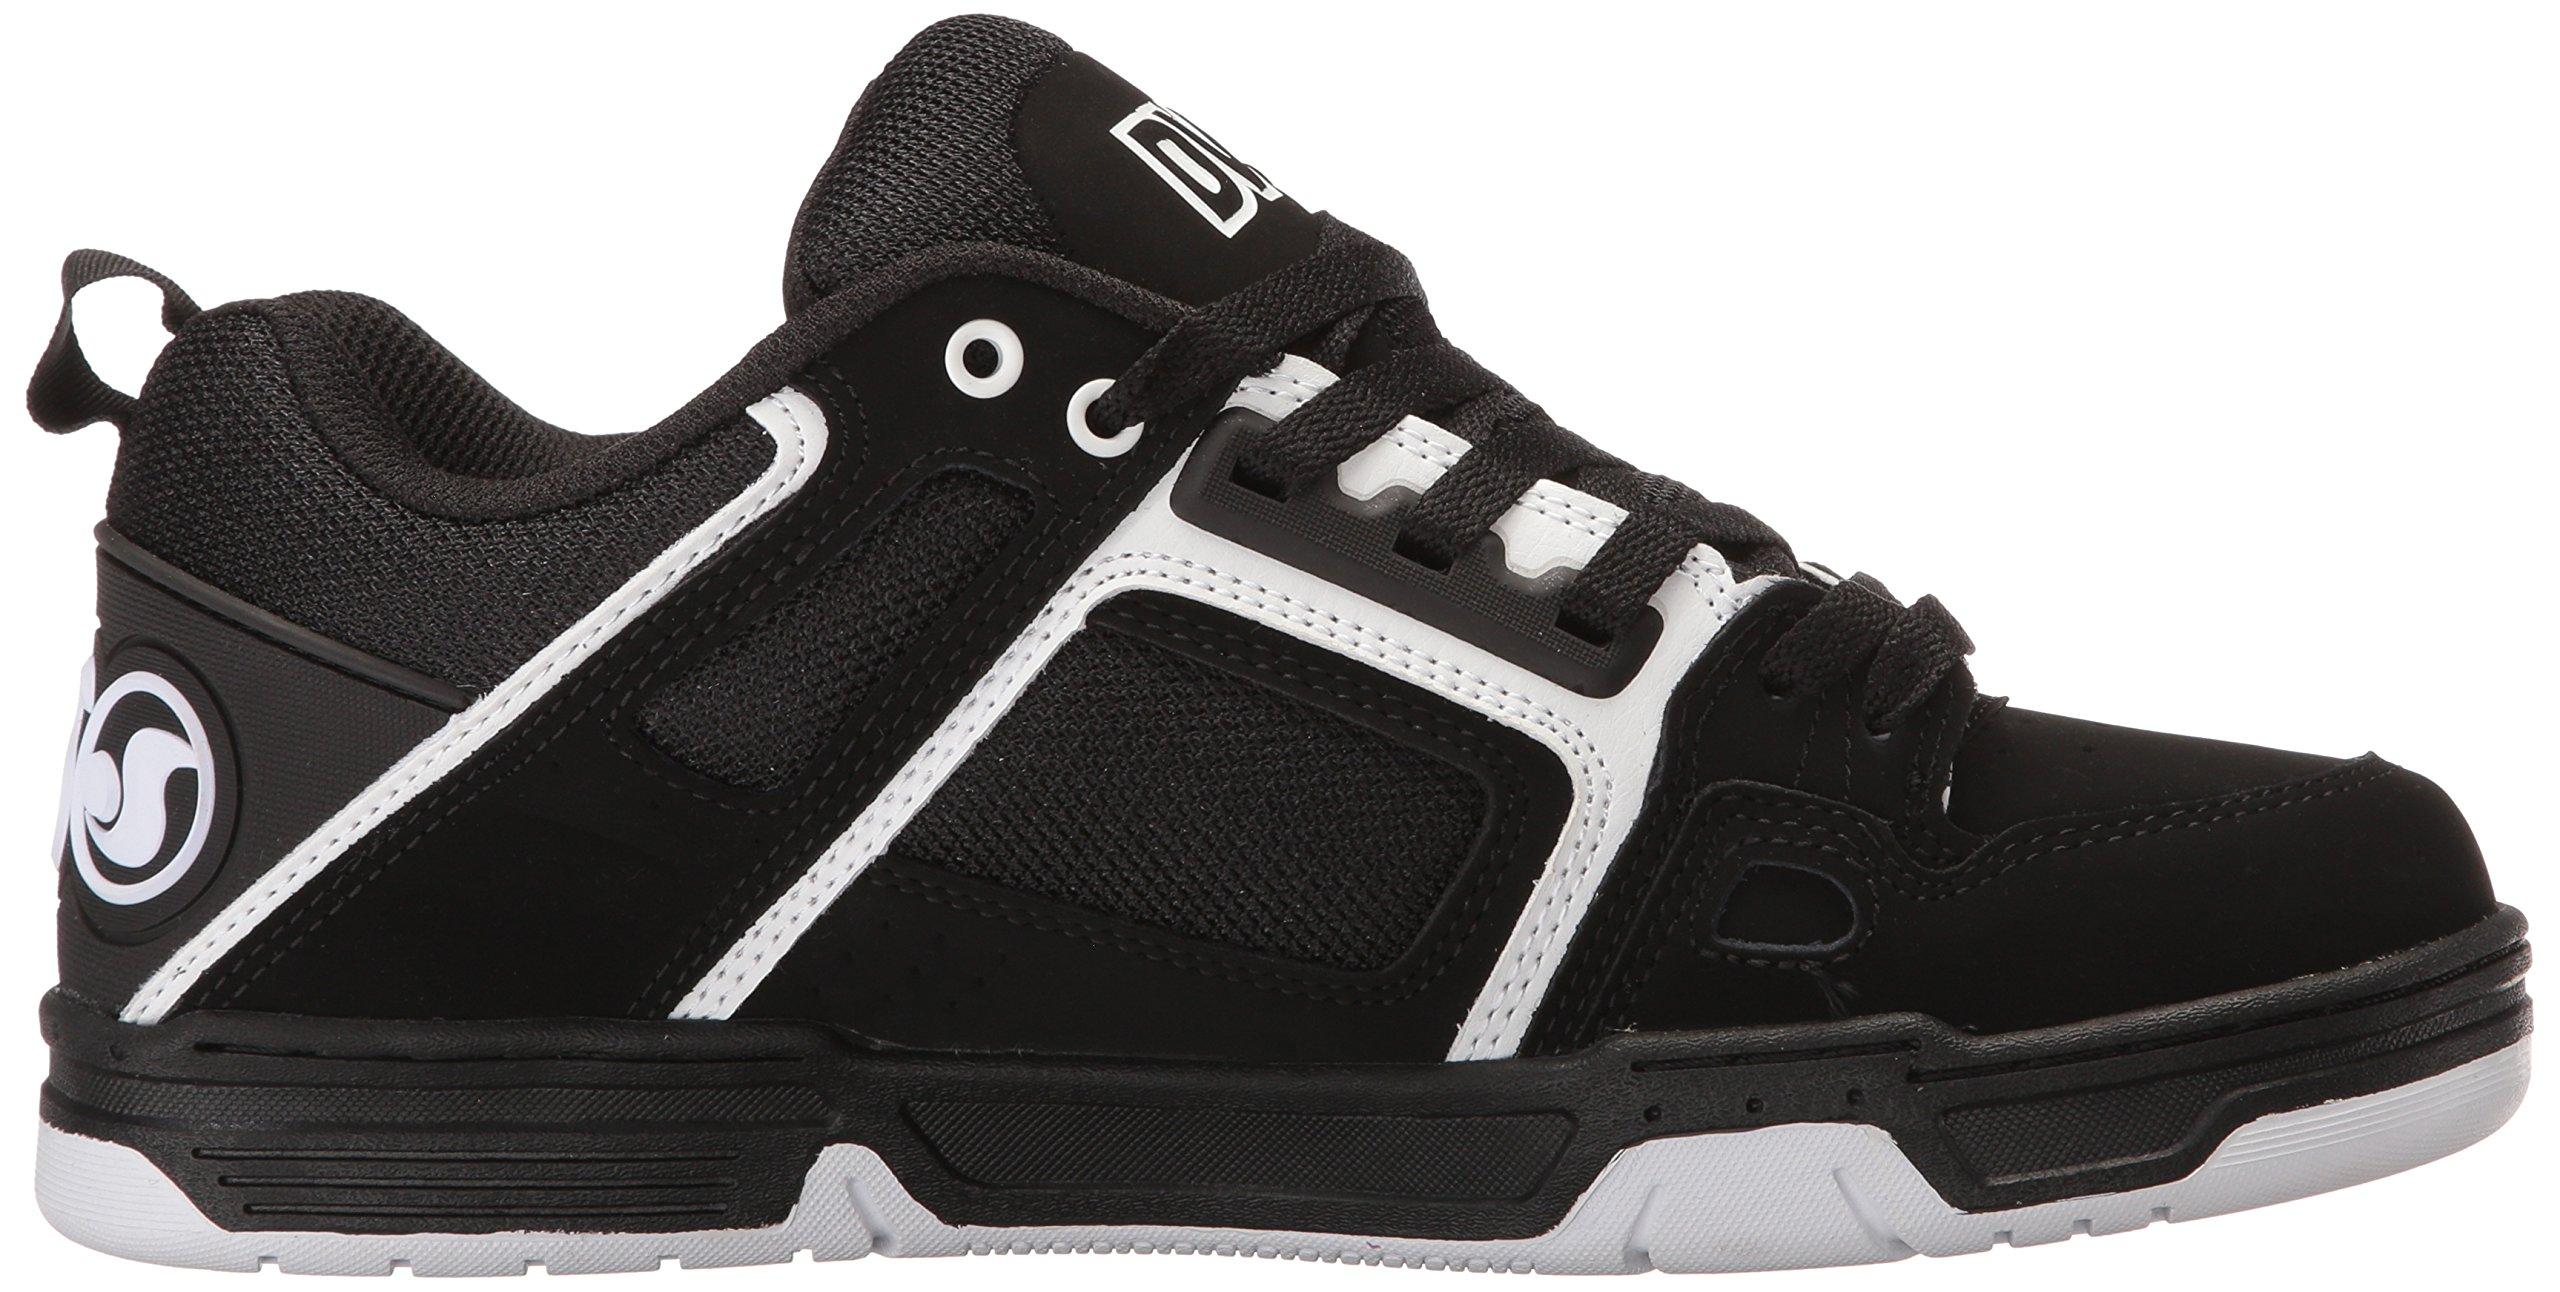 DVS Men's Comanche Skate Shoe, Black/White Nubuck, 12 Medium US by DVS (Image #7)